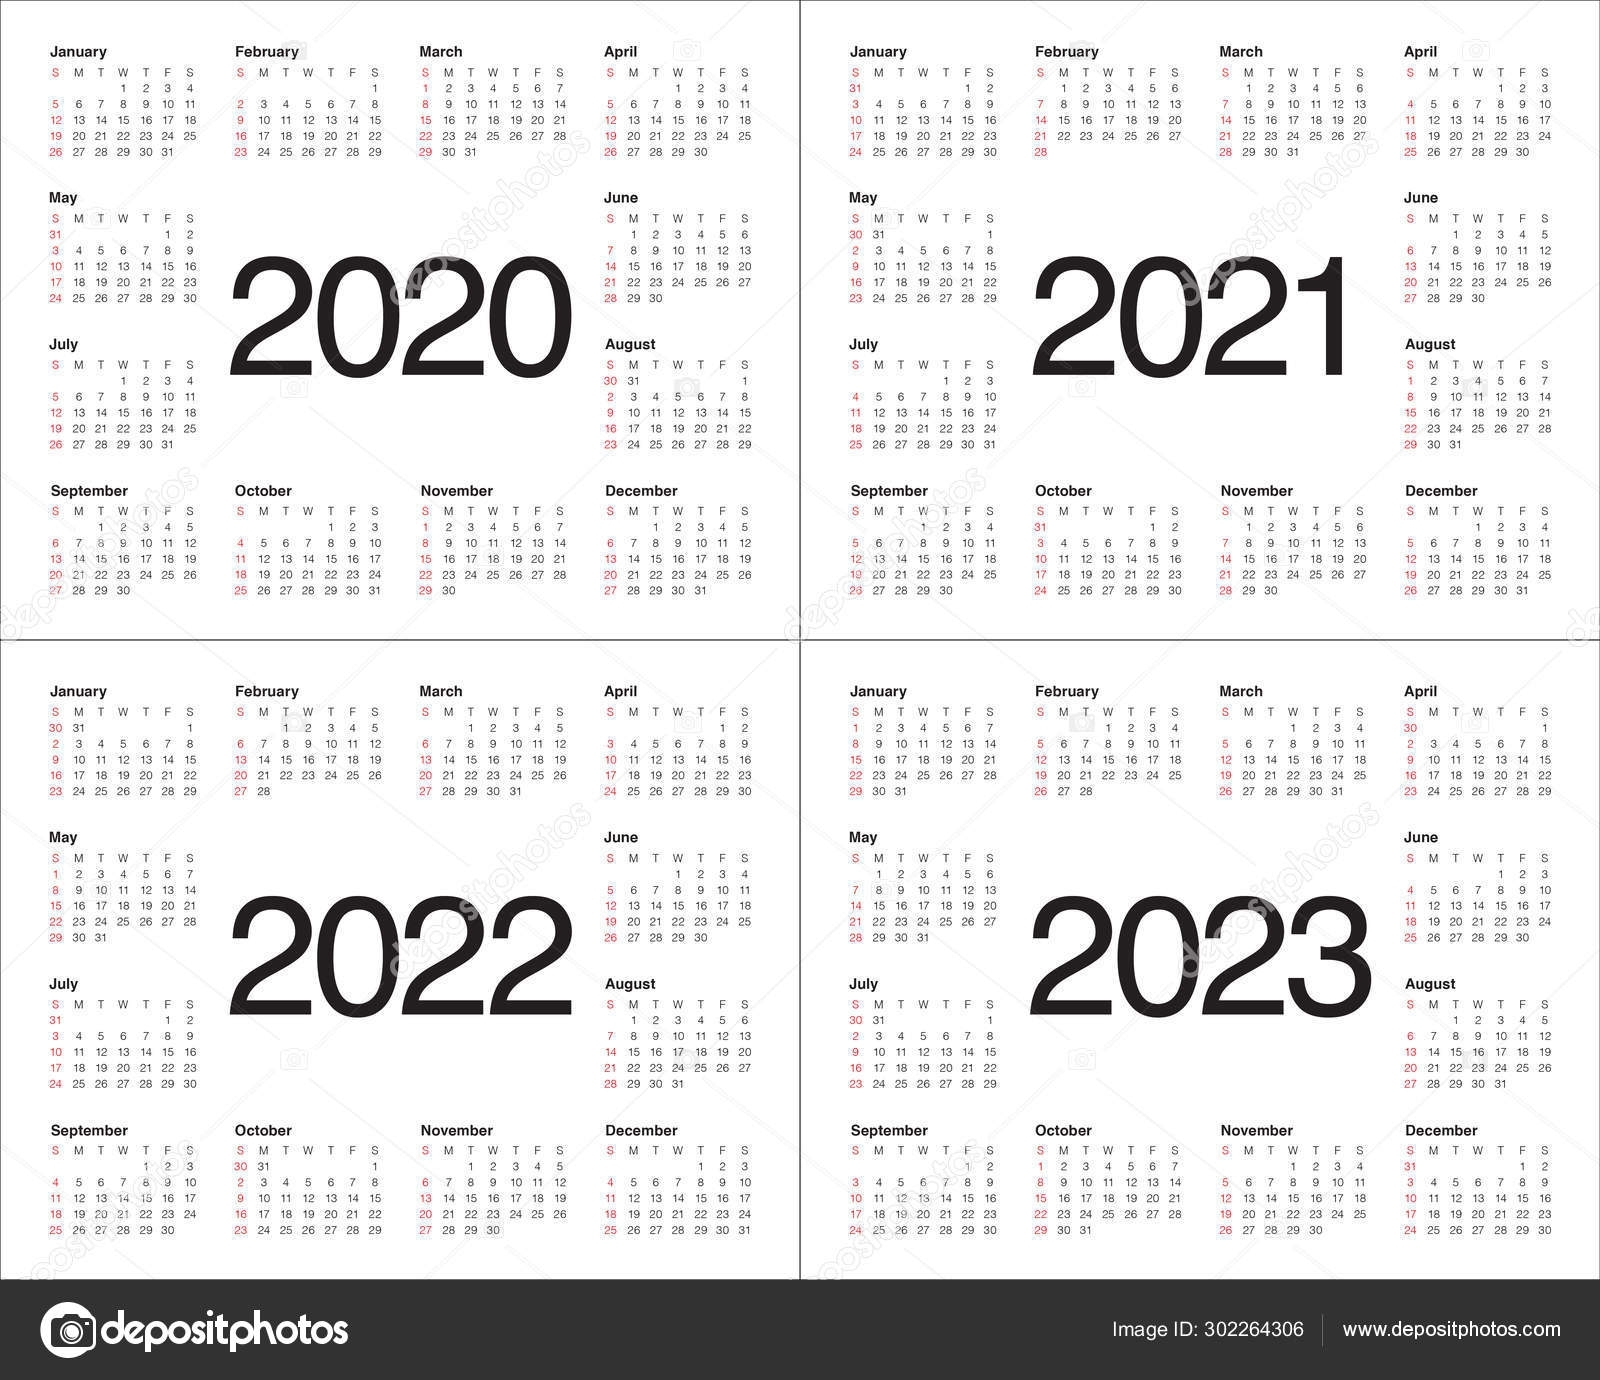 Year 2020 2021 2022 2023 Calendar Vector Design Template 302264306 throughout 2020 2021 2022 2023 Calendar